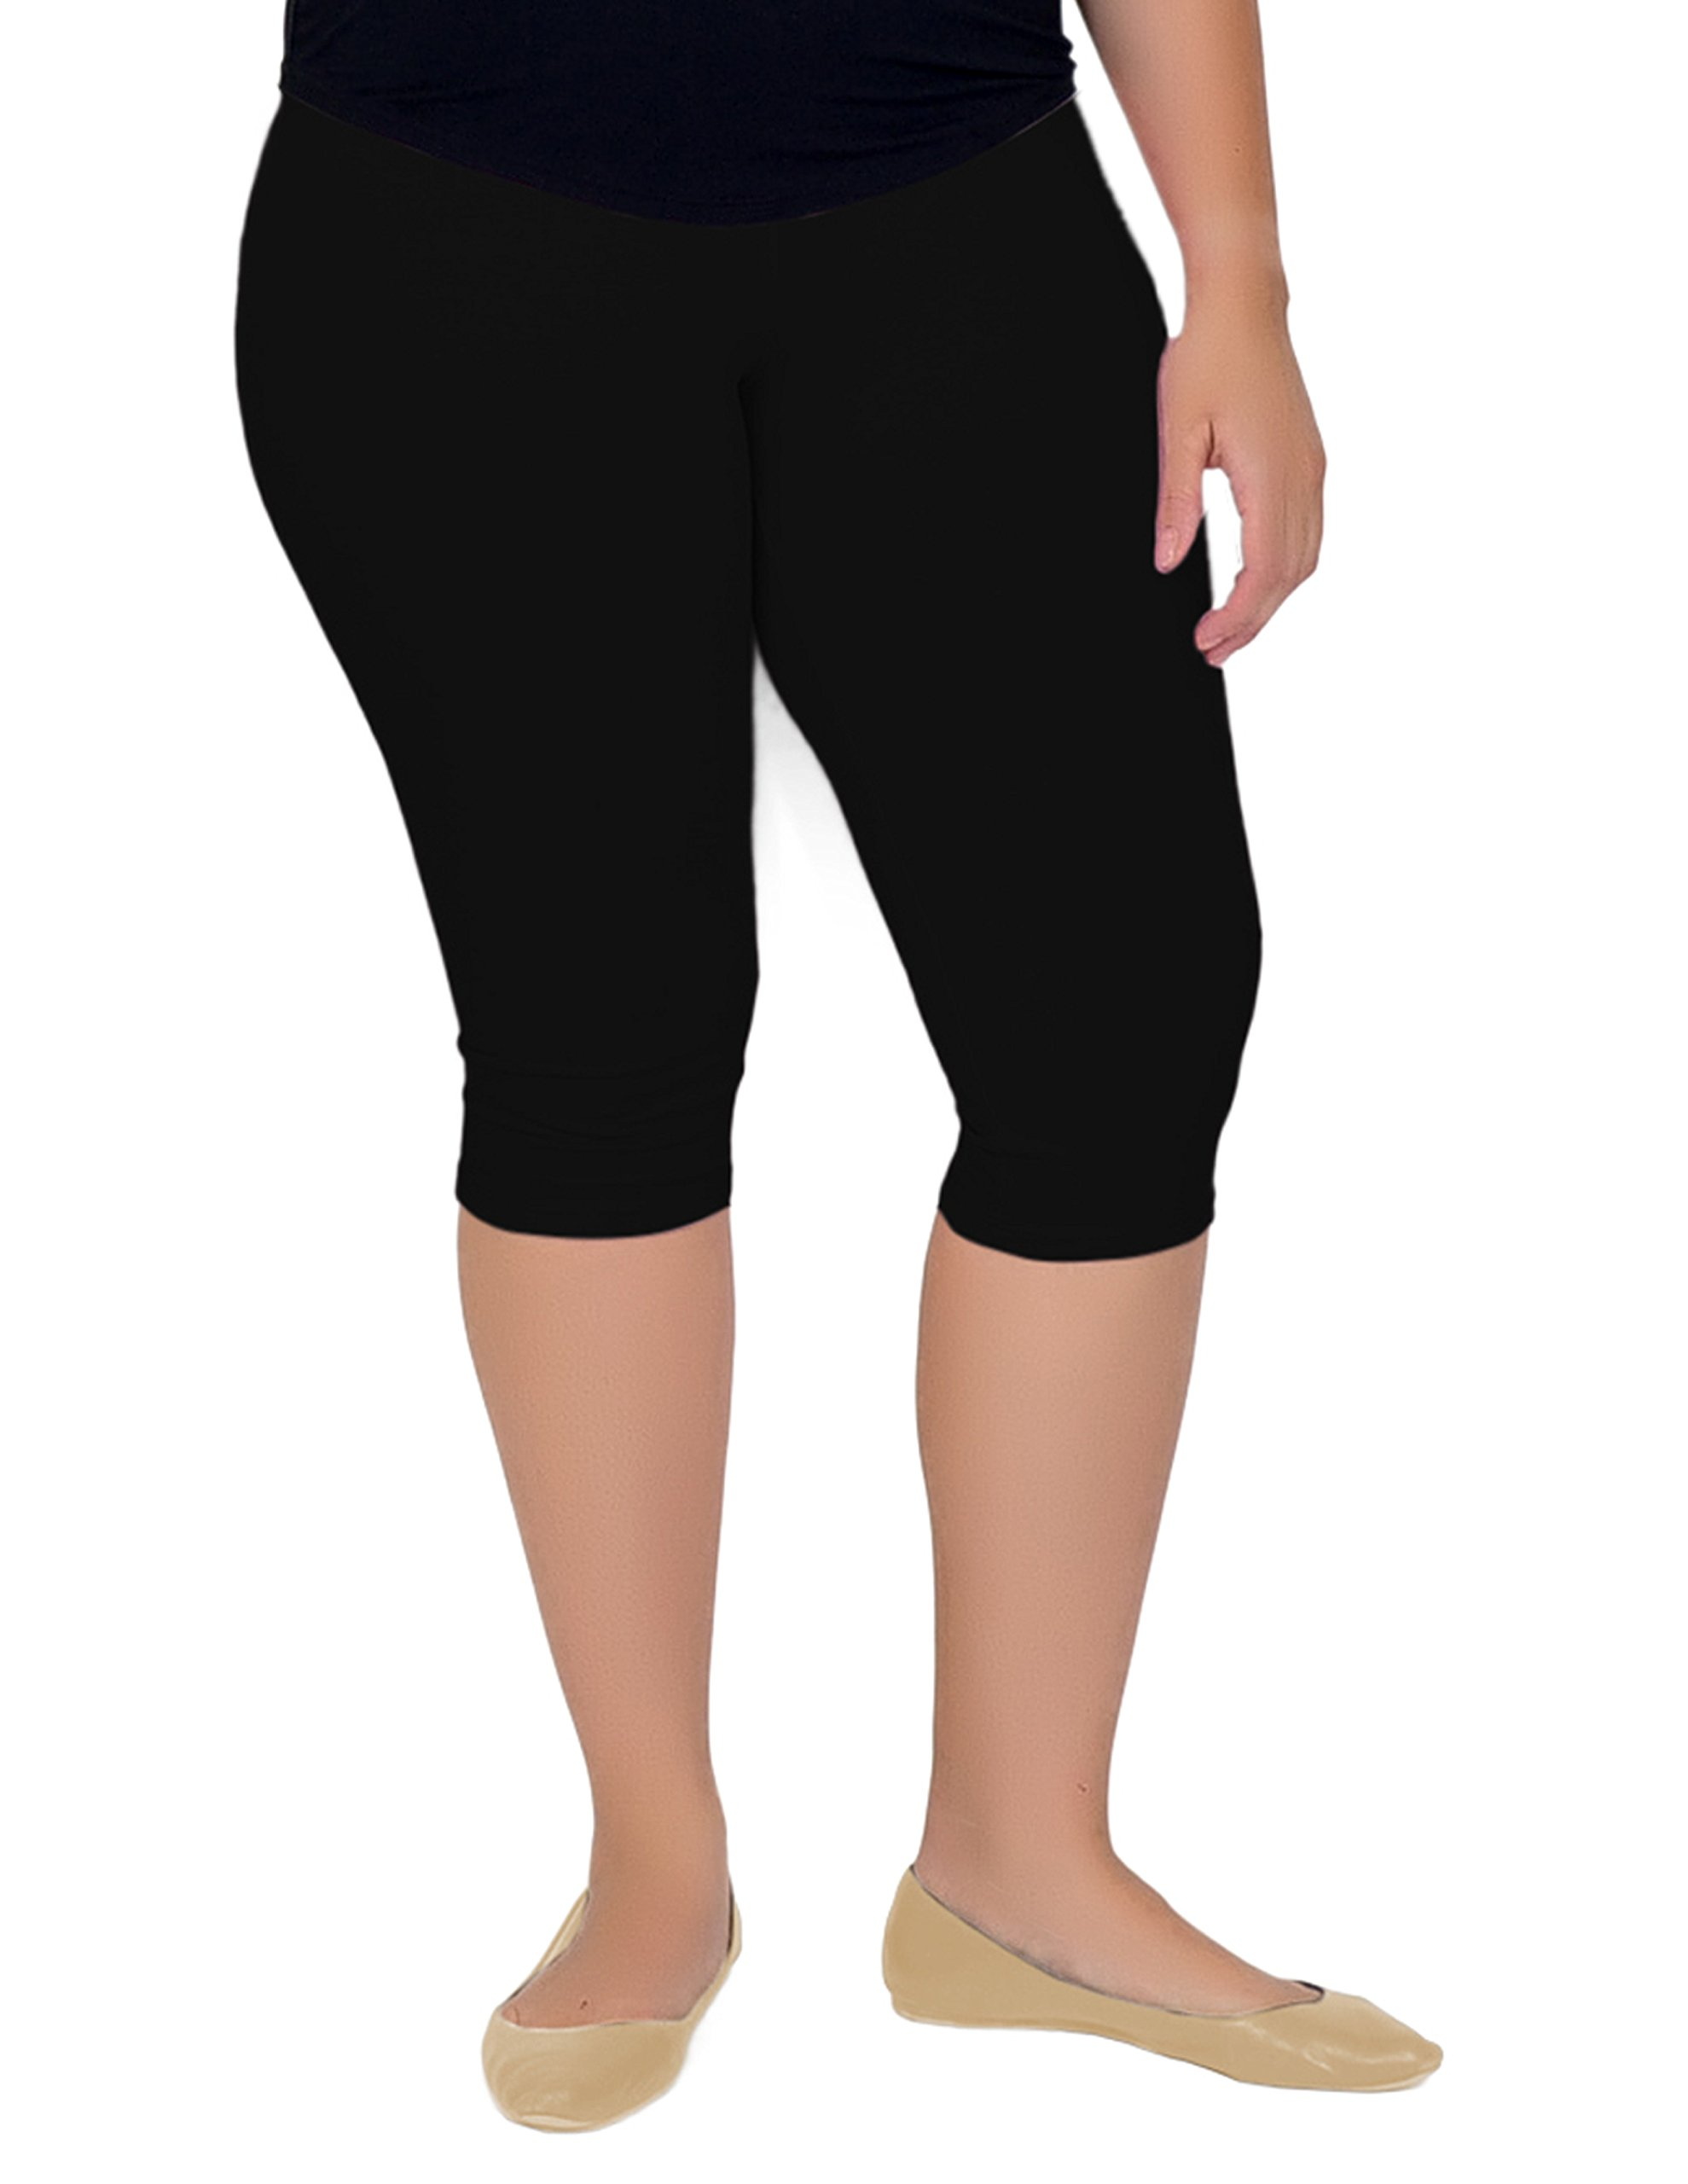 Stretch is Comfort Women's Knee-Length Leggings Black 2X